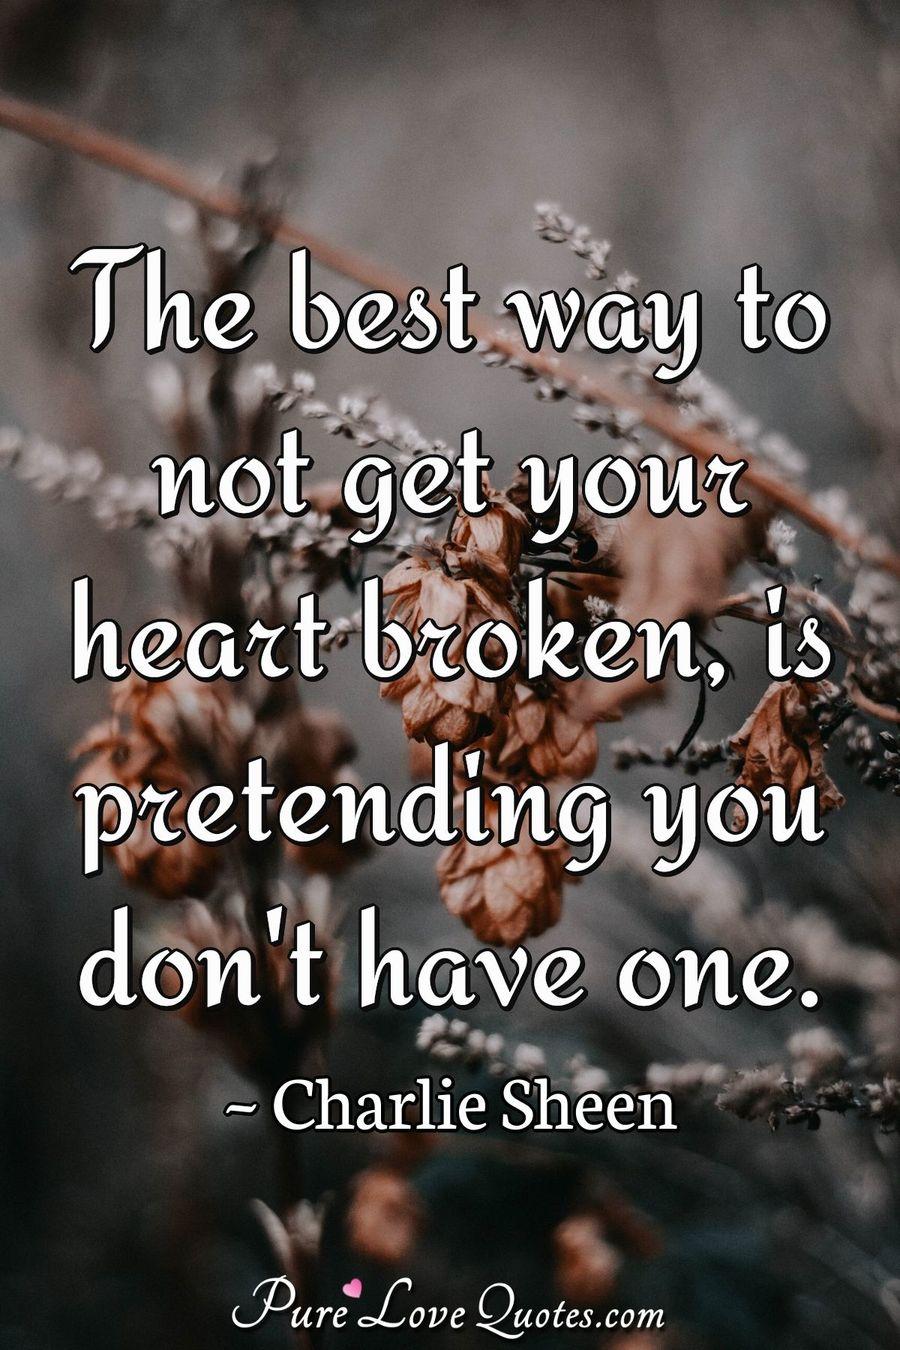 How to avoid getting heart broken